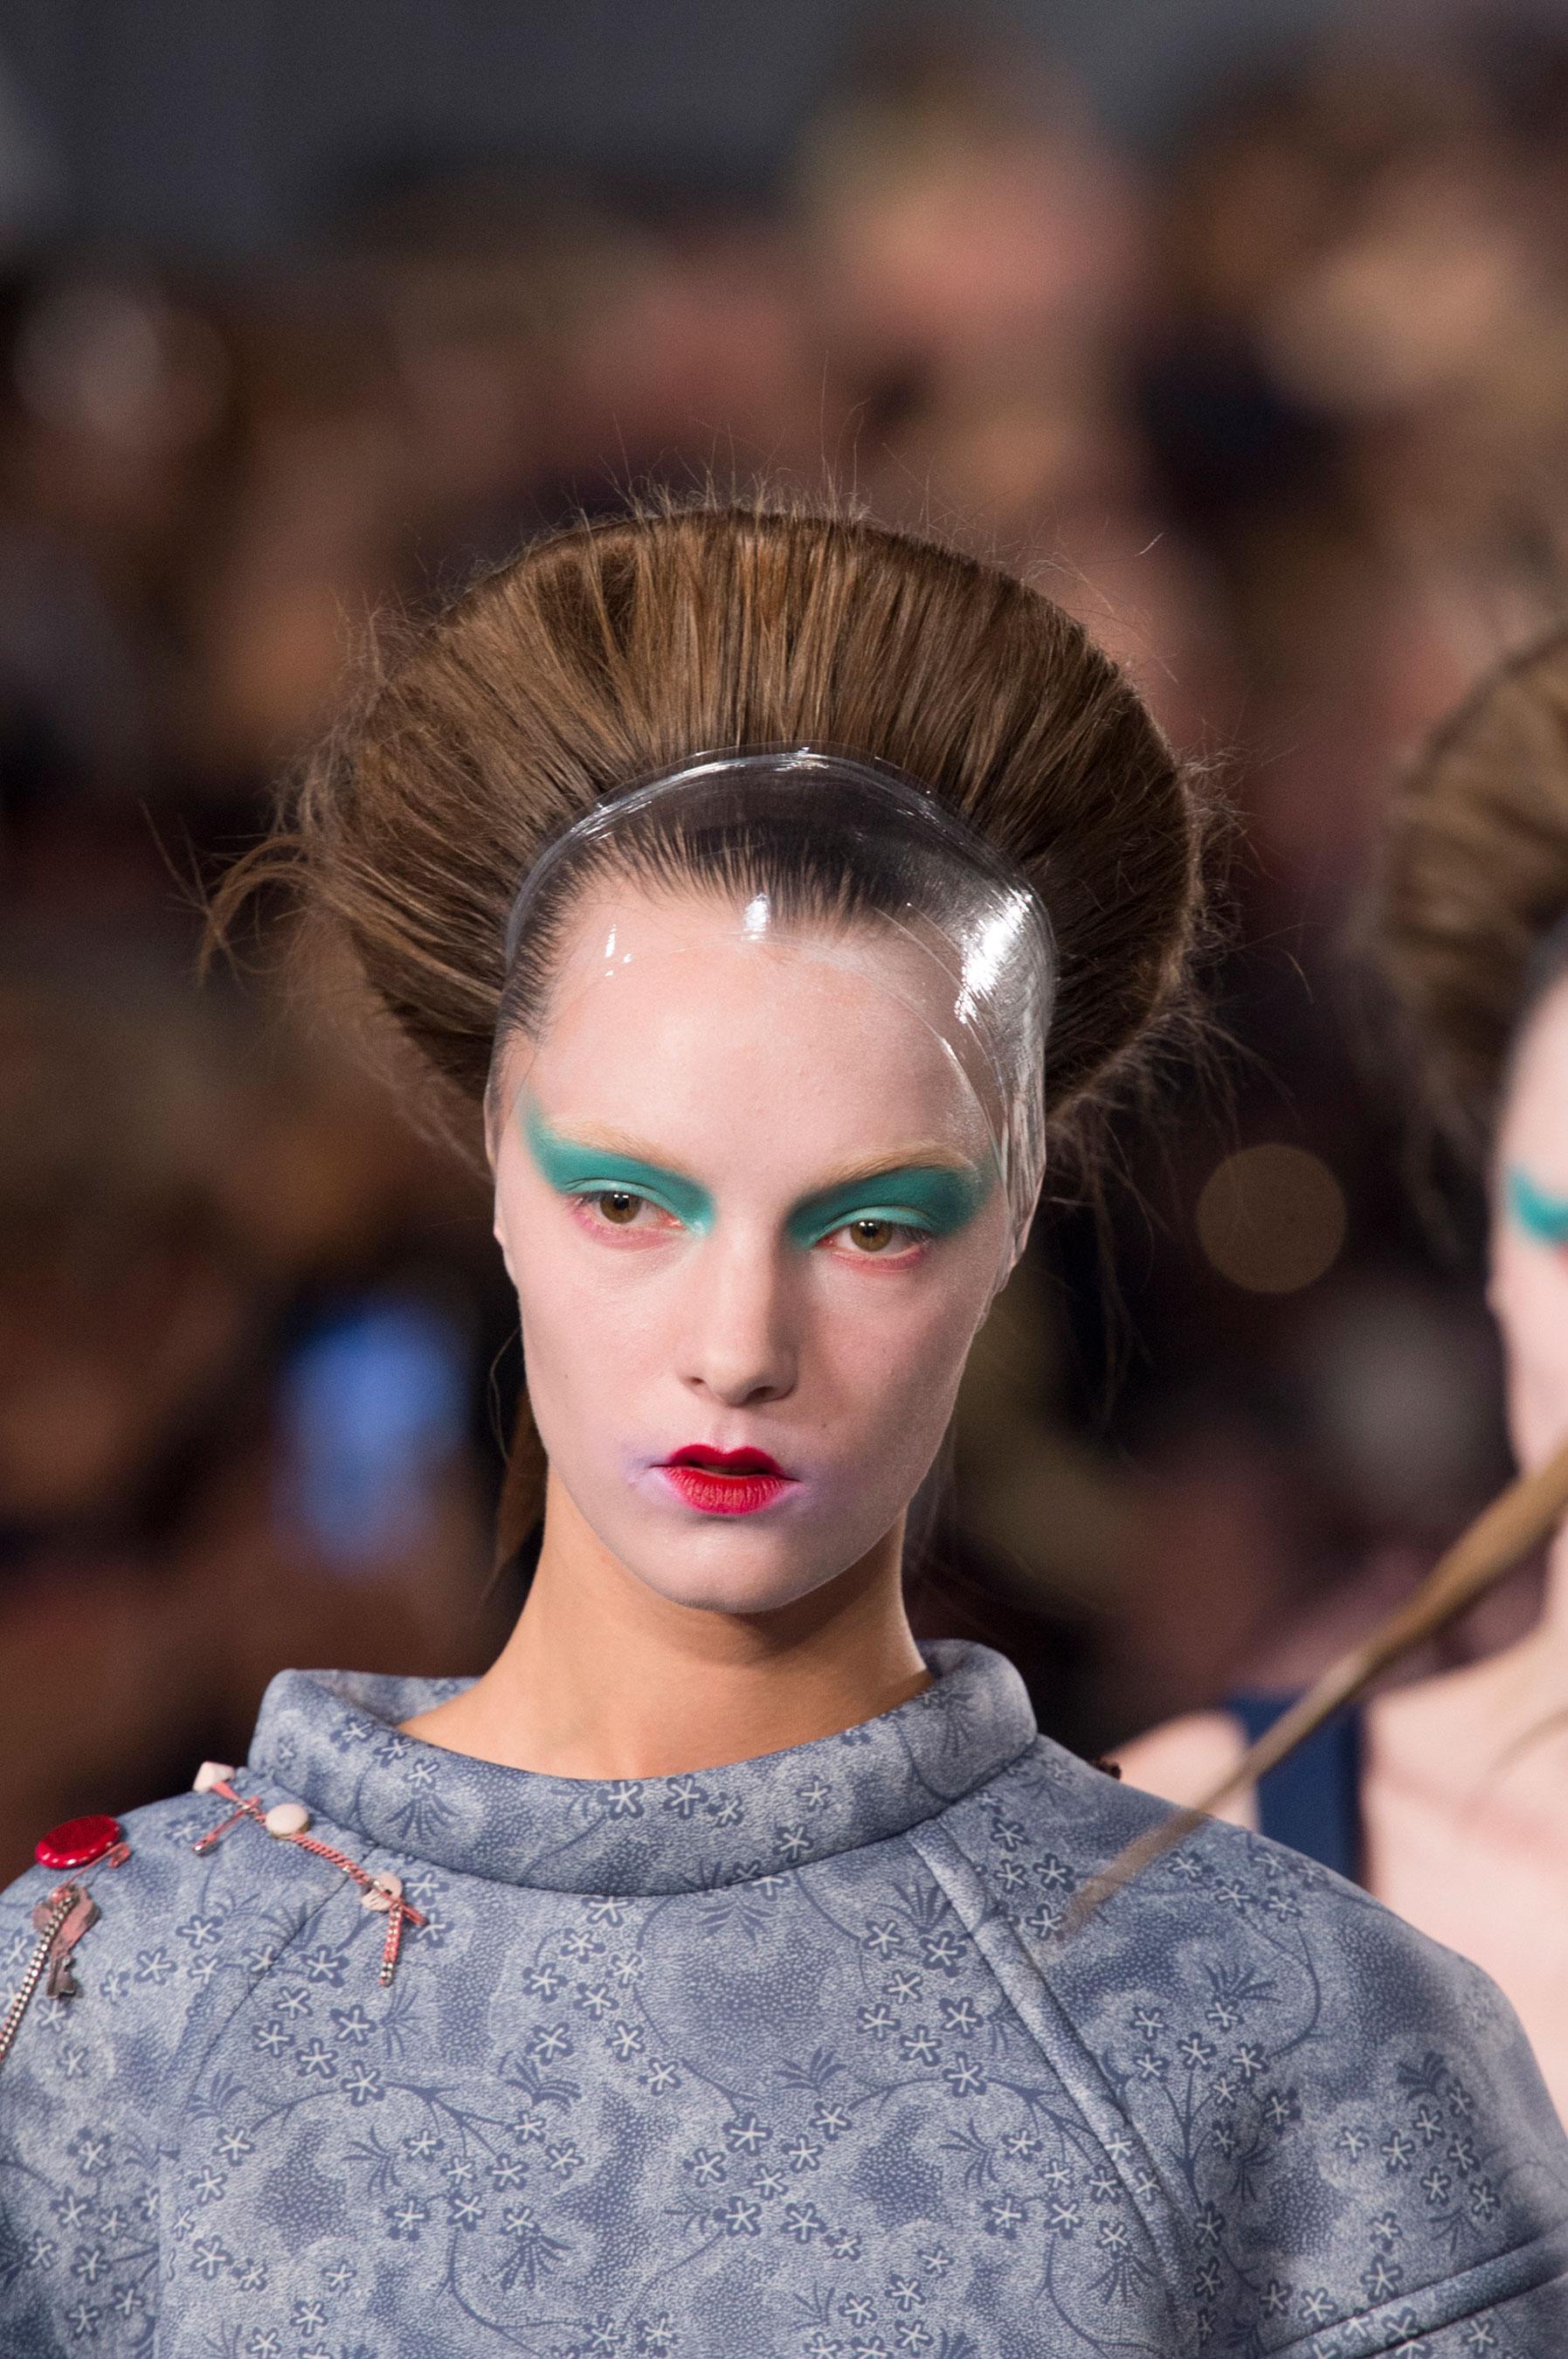 Maison-Margiela-spring-2016-runway-beauty-fashion-show-the-impression-079